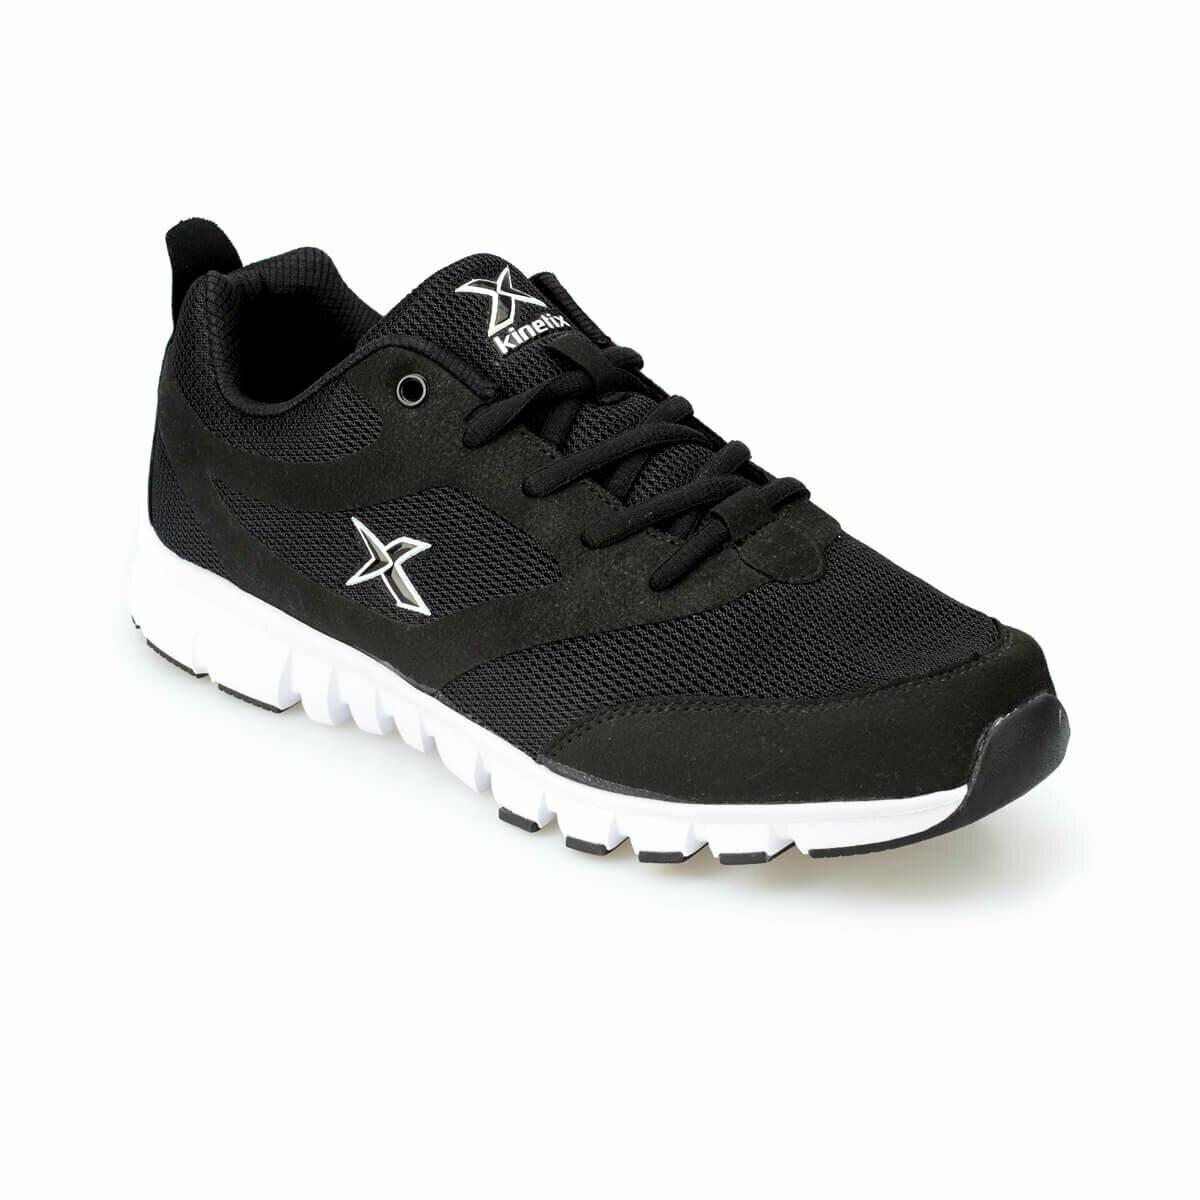 Flo Zwarte Mannen Sneaker Schoenen Nieuwe Mesh Mannen Sneakers Casual Schoenen Lac-Up Mannen Schoenen Lichtgewicht Comfortabele Ademende Wandelschoenen sneakers Zapatillas Hombre Kinetix Almera